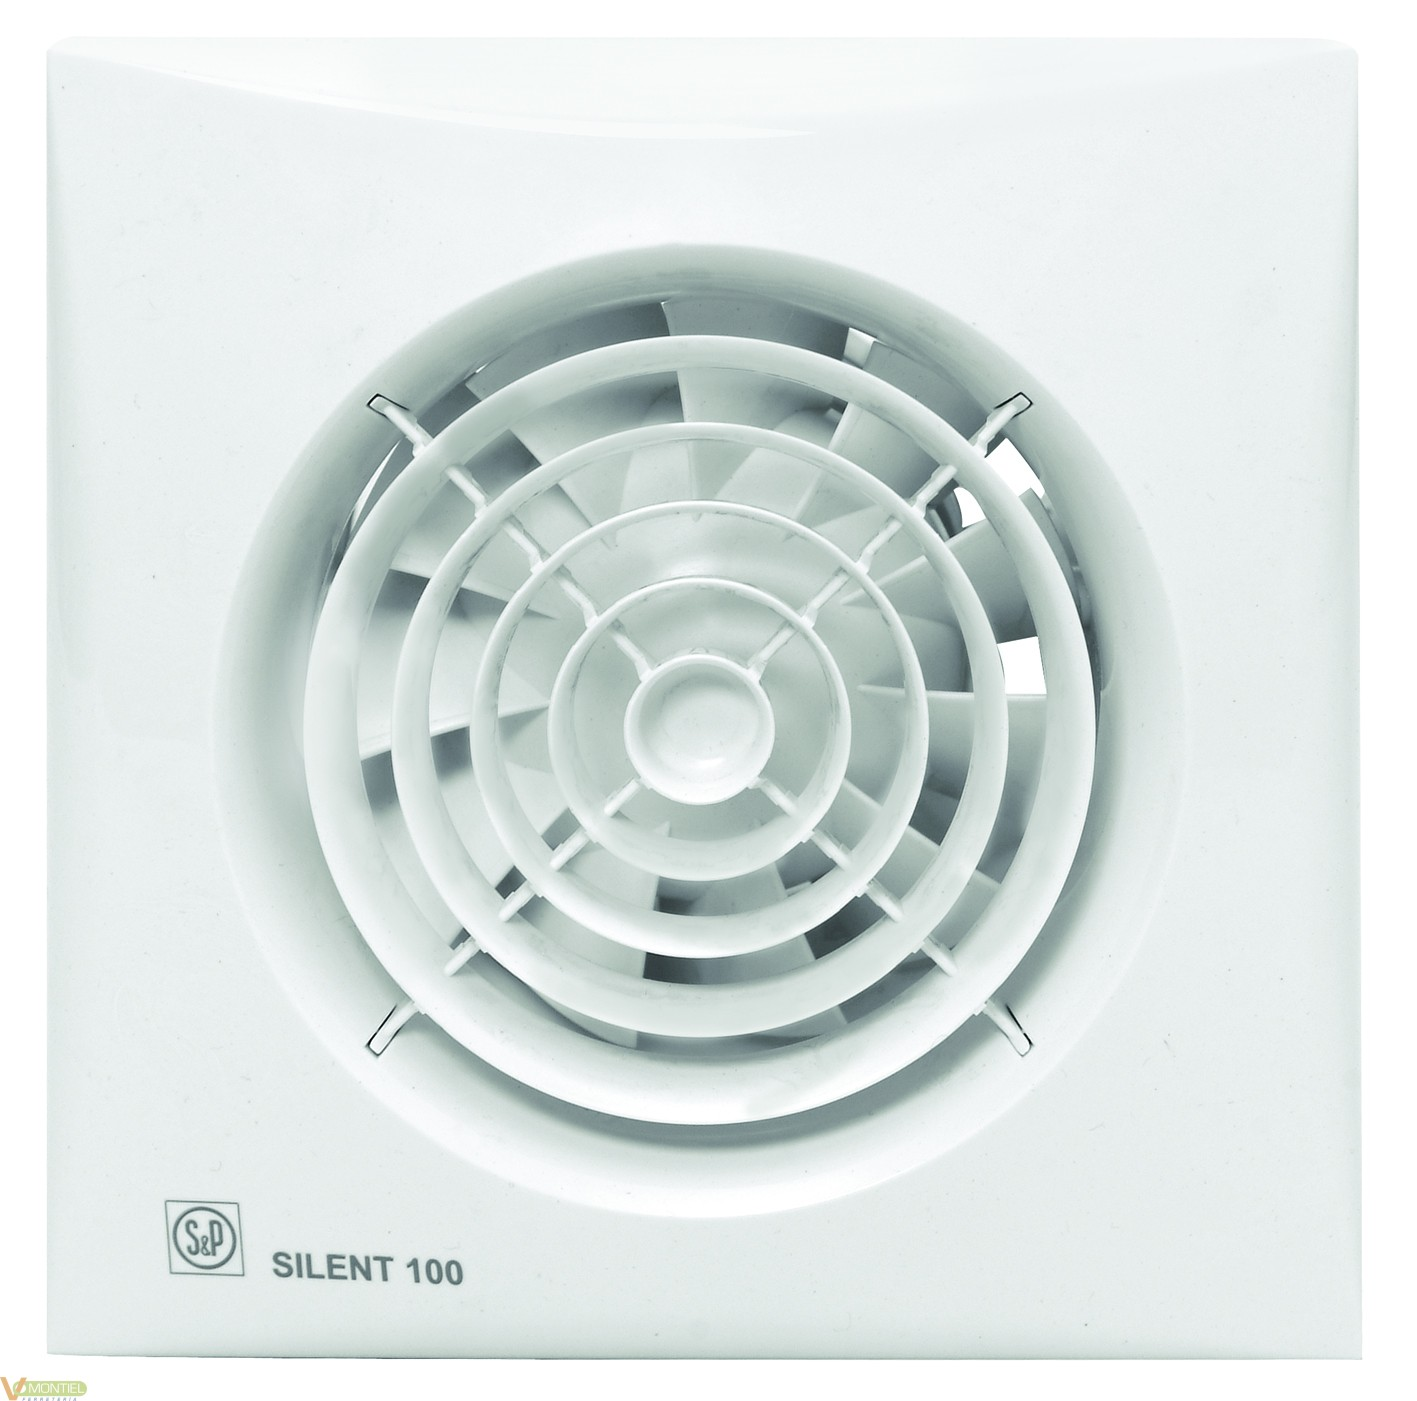 Extractor Baño Funcion:Extractor baño silent 100 cz online